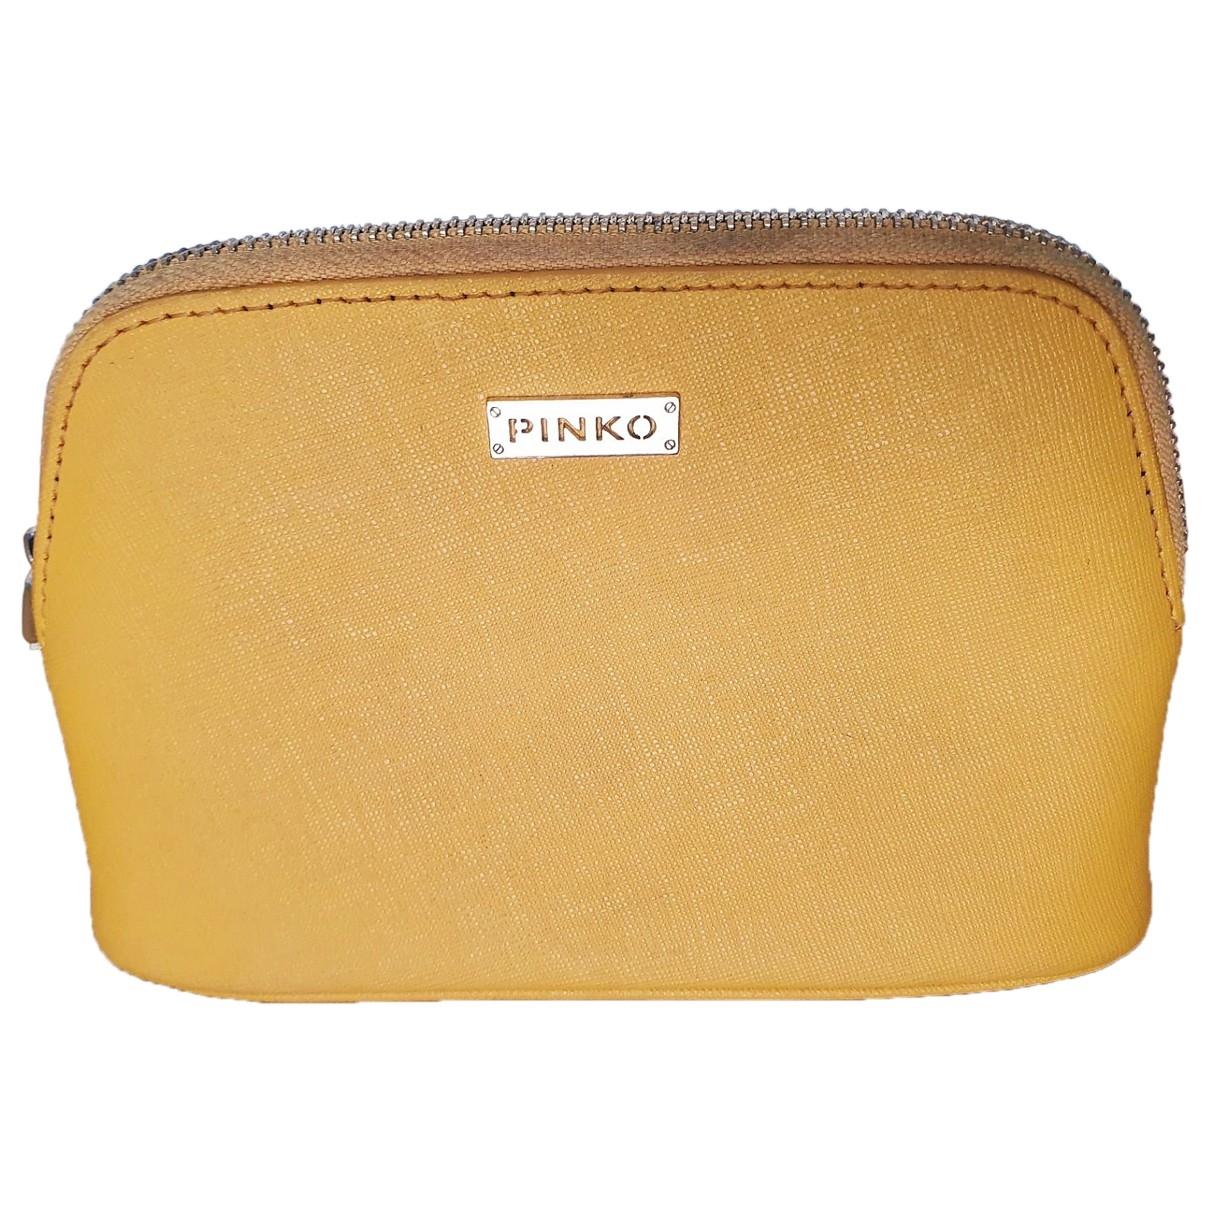 Pinko - Petite maroquinerie   pour femme en cuir - jaune